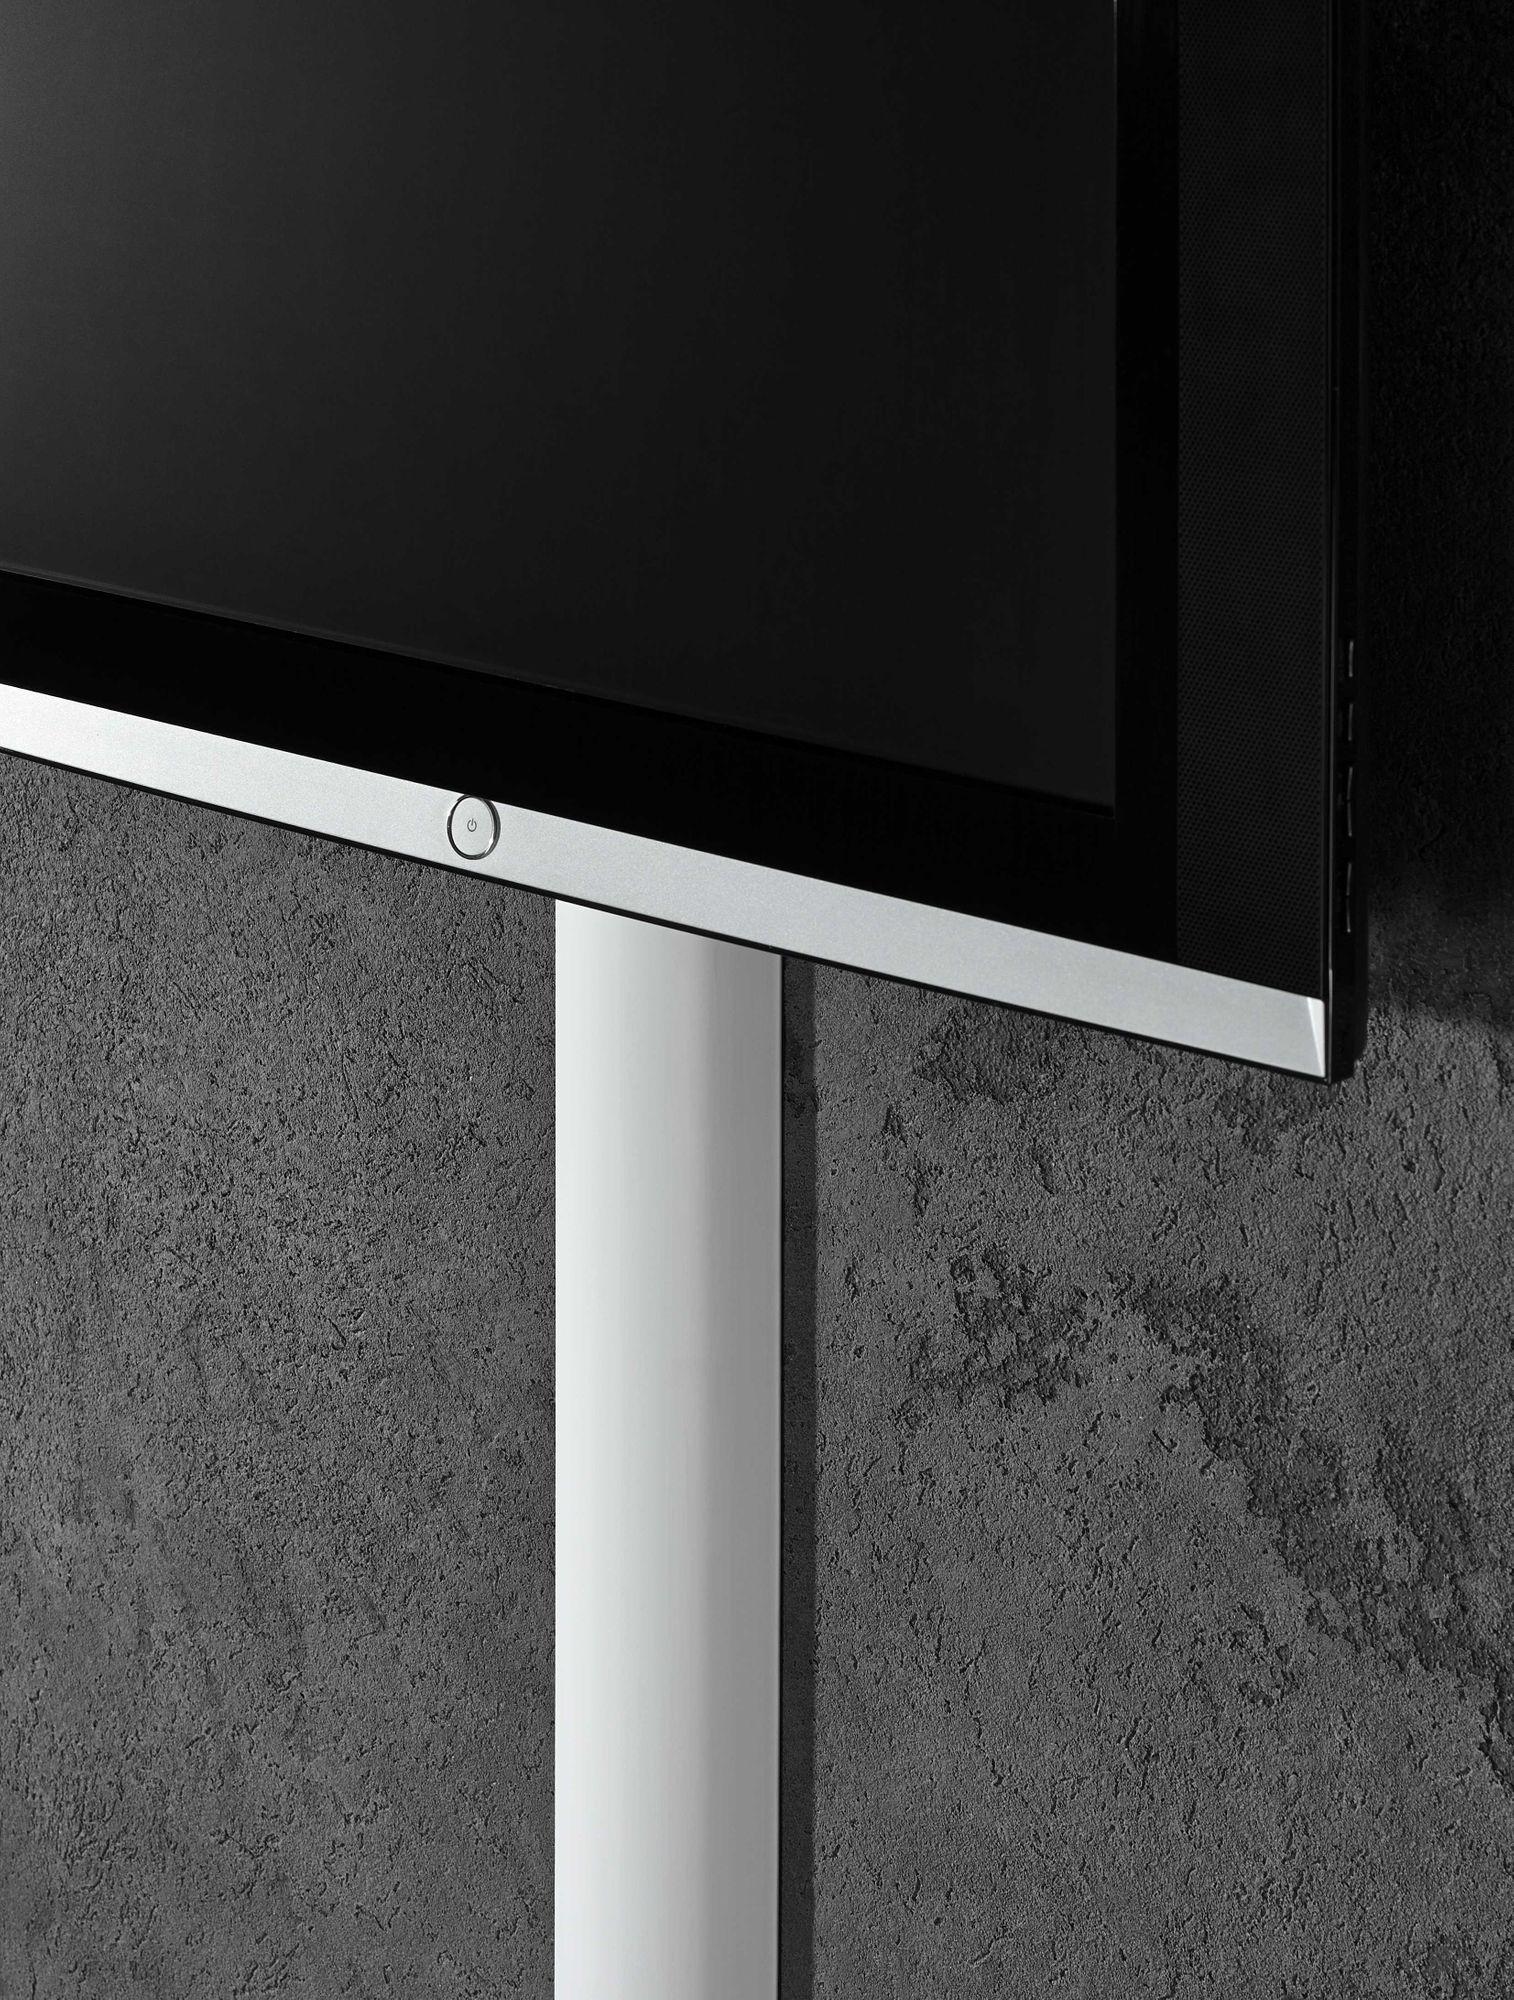 1 meter kabelkanalleiste kabelabdeckleiste profil innen sto fest 120x15mm st1 wand kabelkanal. Black Bedroom Furniture Sets. Home Design Ideas